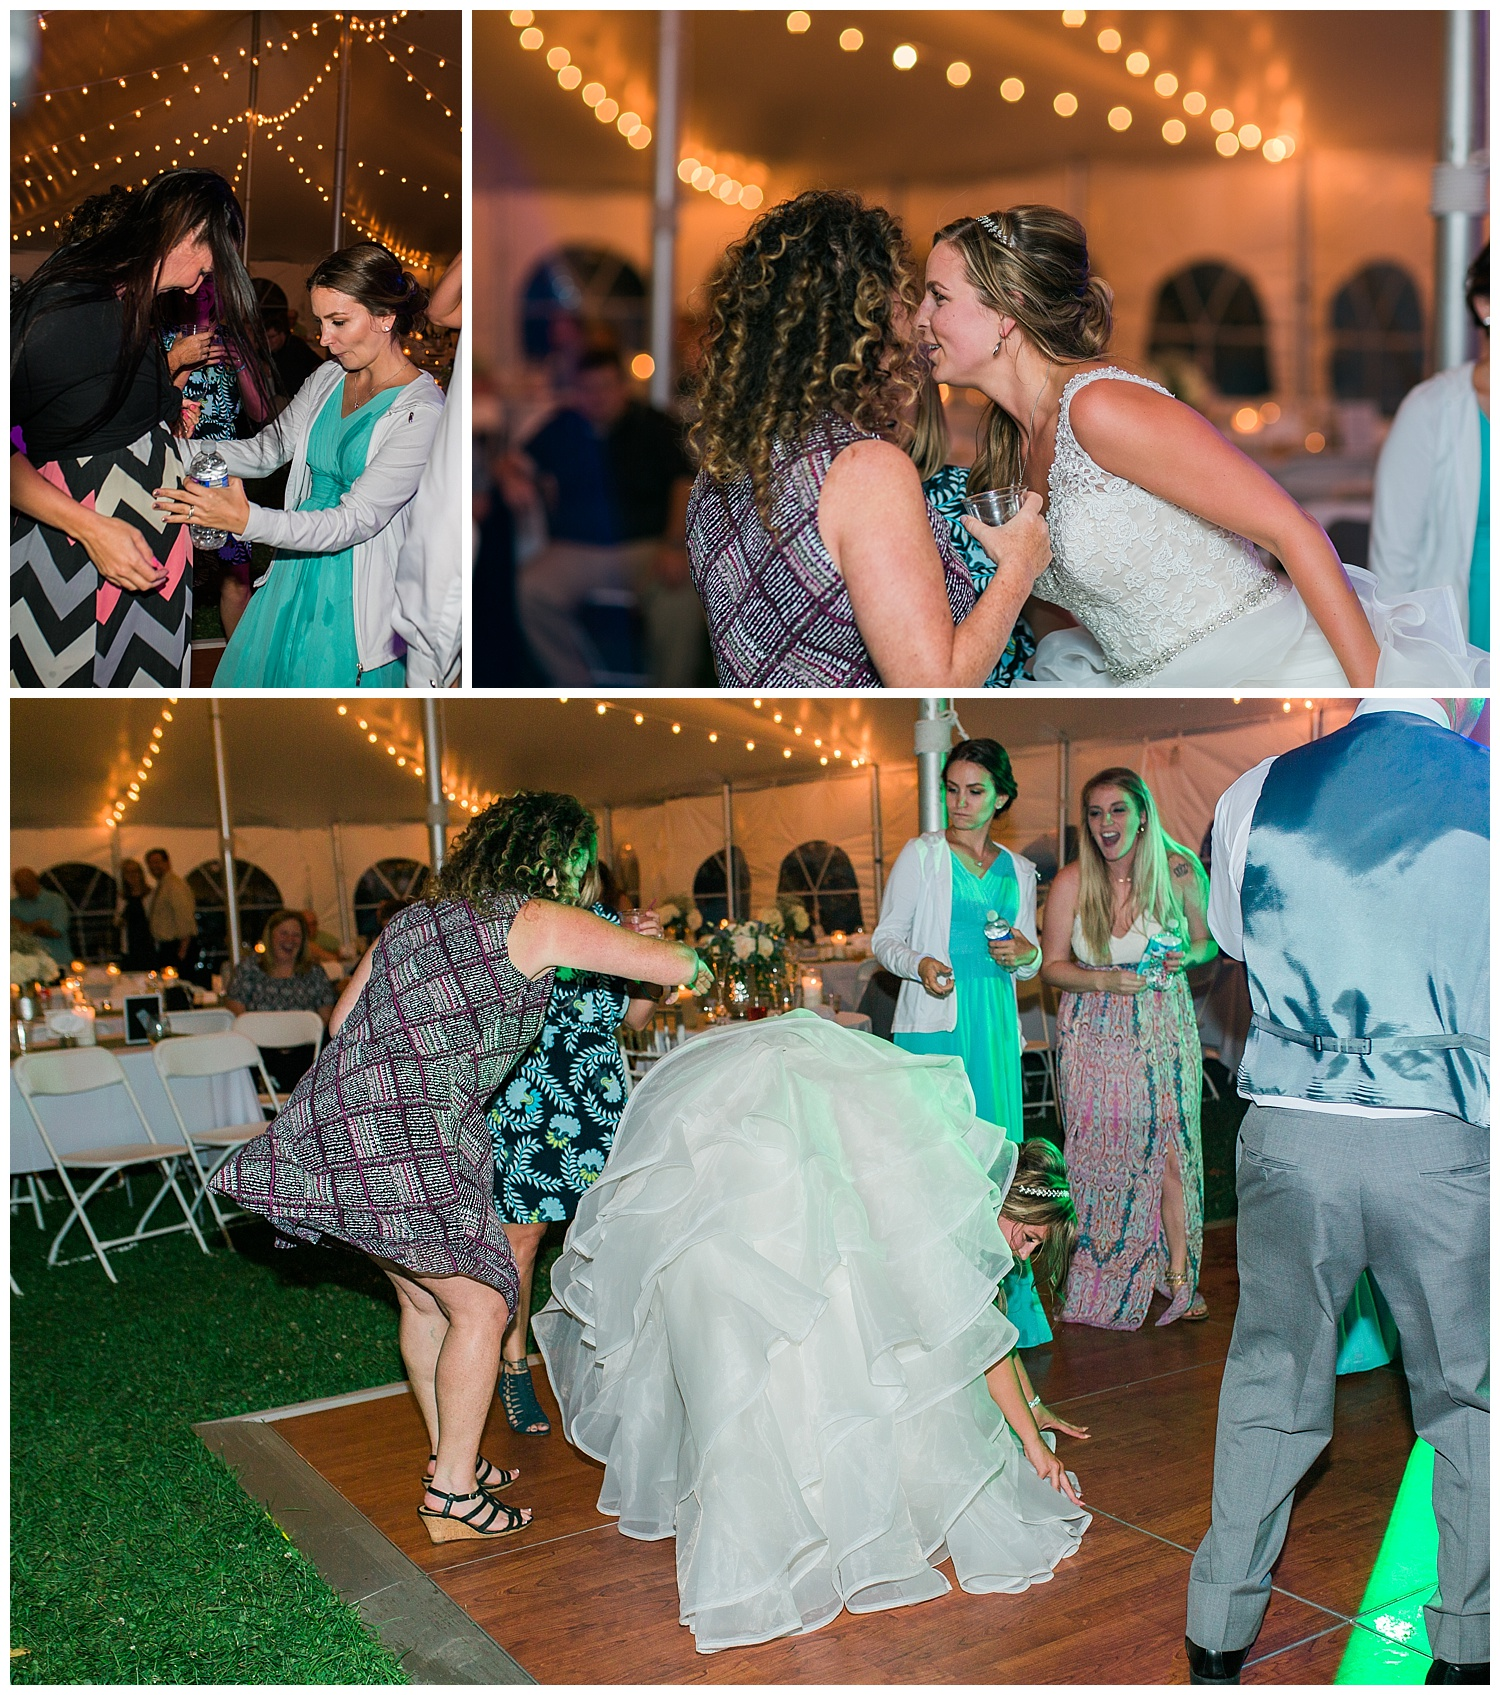 Sean and Andrea - Webster wedding - lass and beau-1639_Buffalo wedding photography.jpg